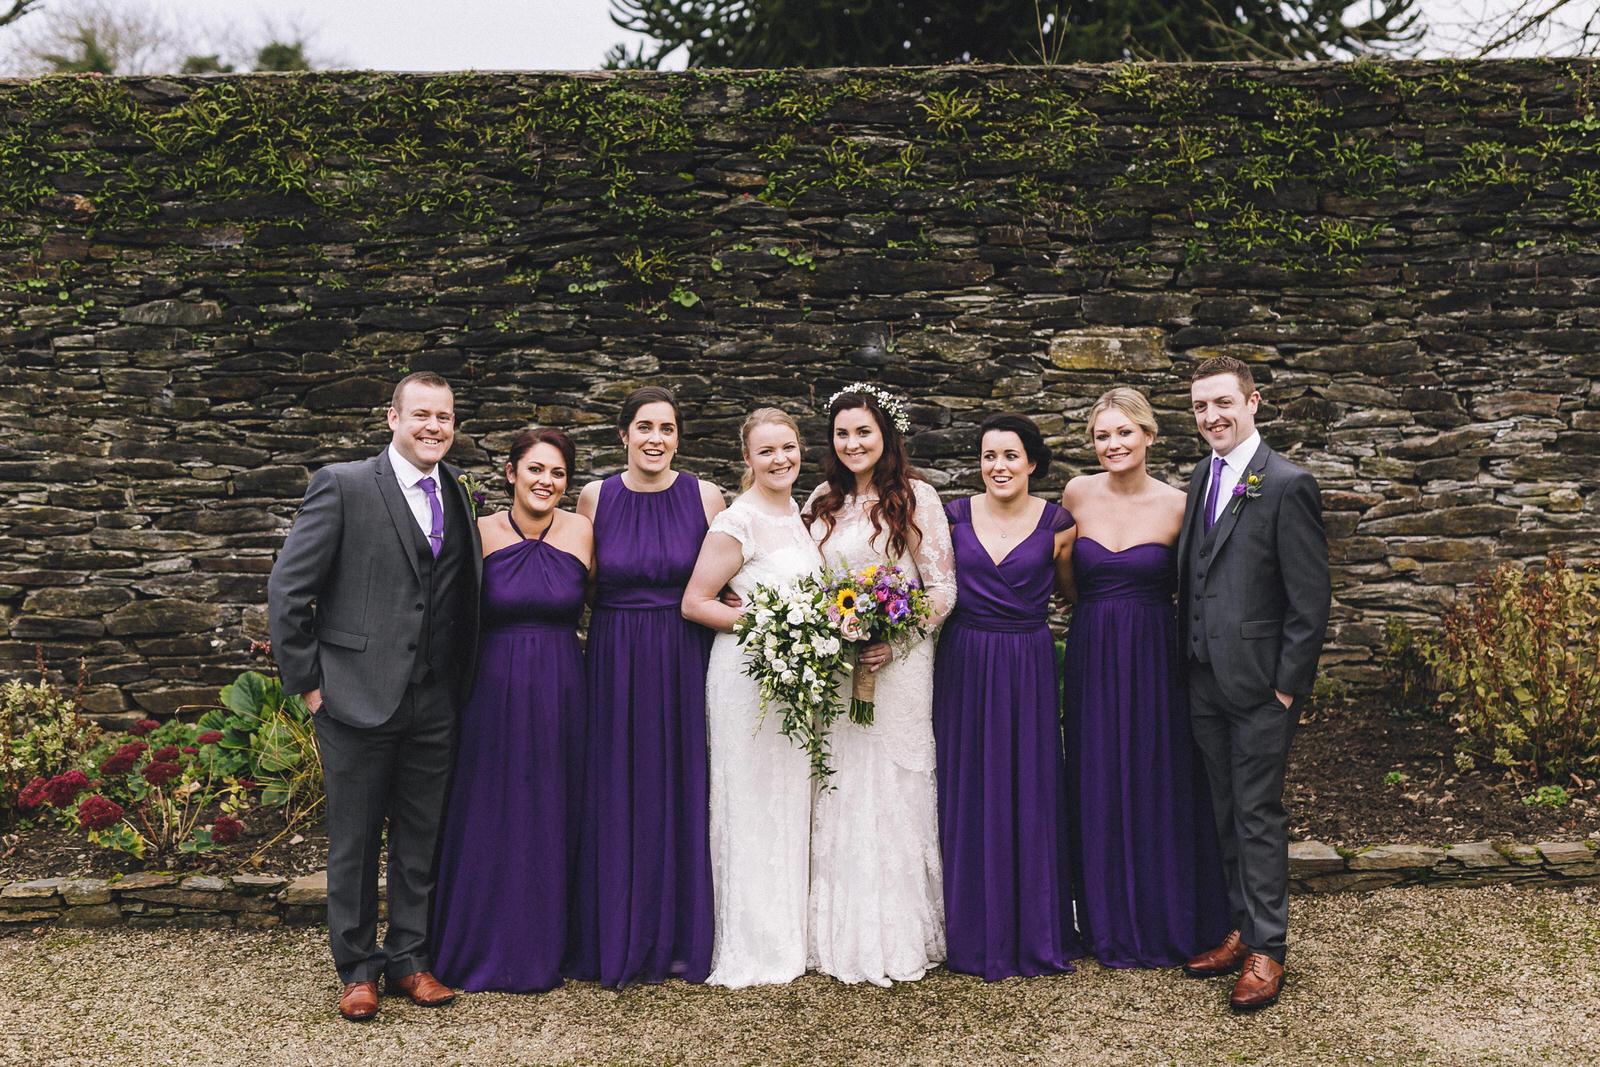 Balybeg-house-ireland-wicklow-wedding-photographer-roger-kenny_greystones088.jpg